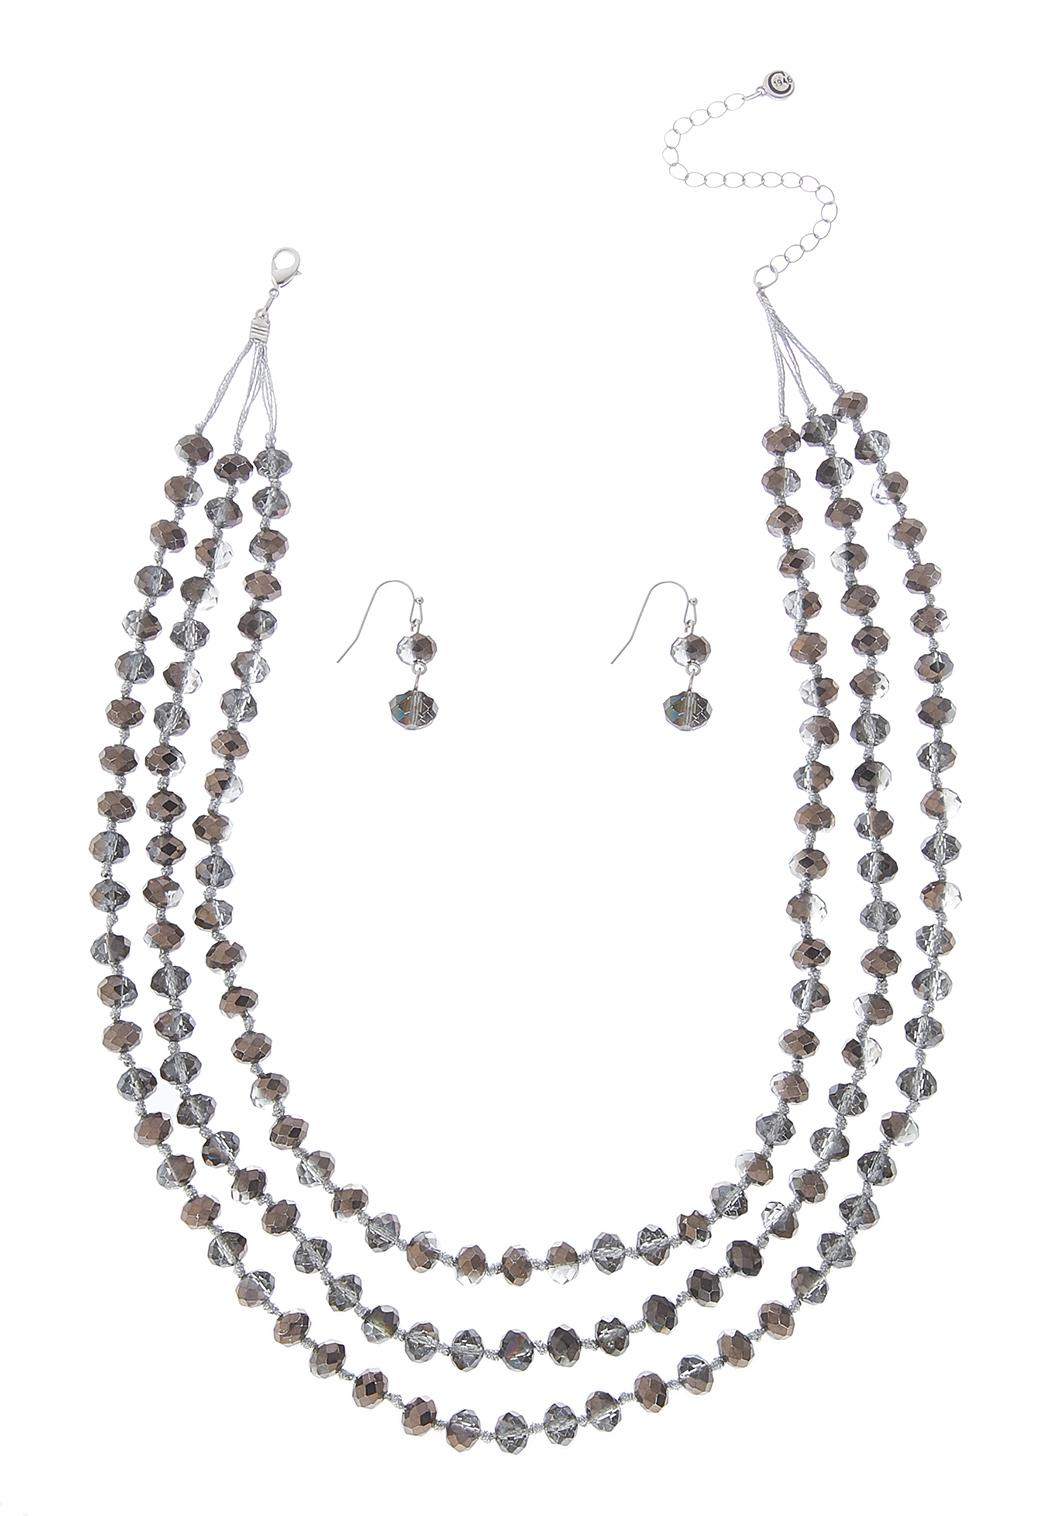 Hematite Layered Necklace Set